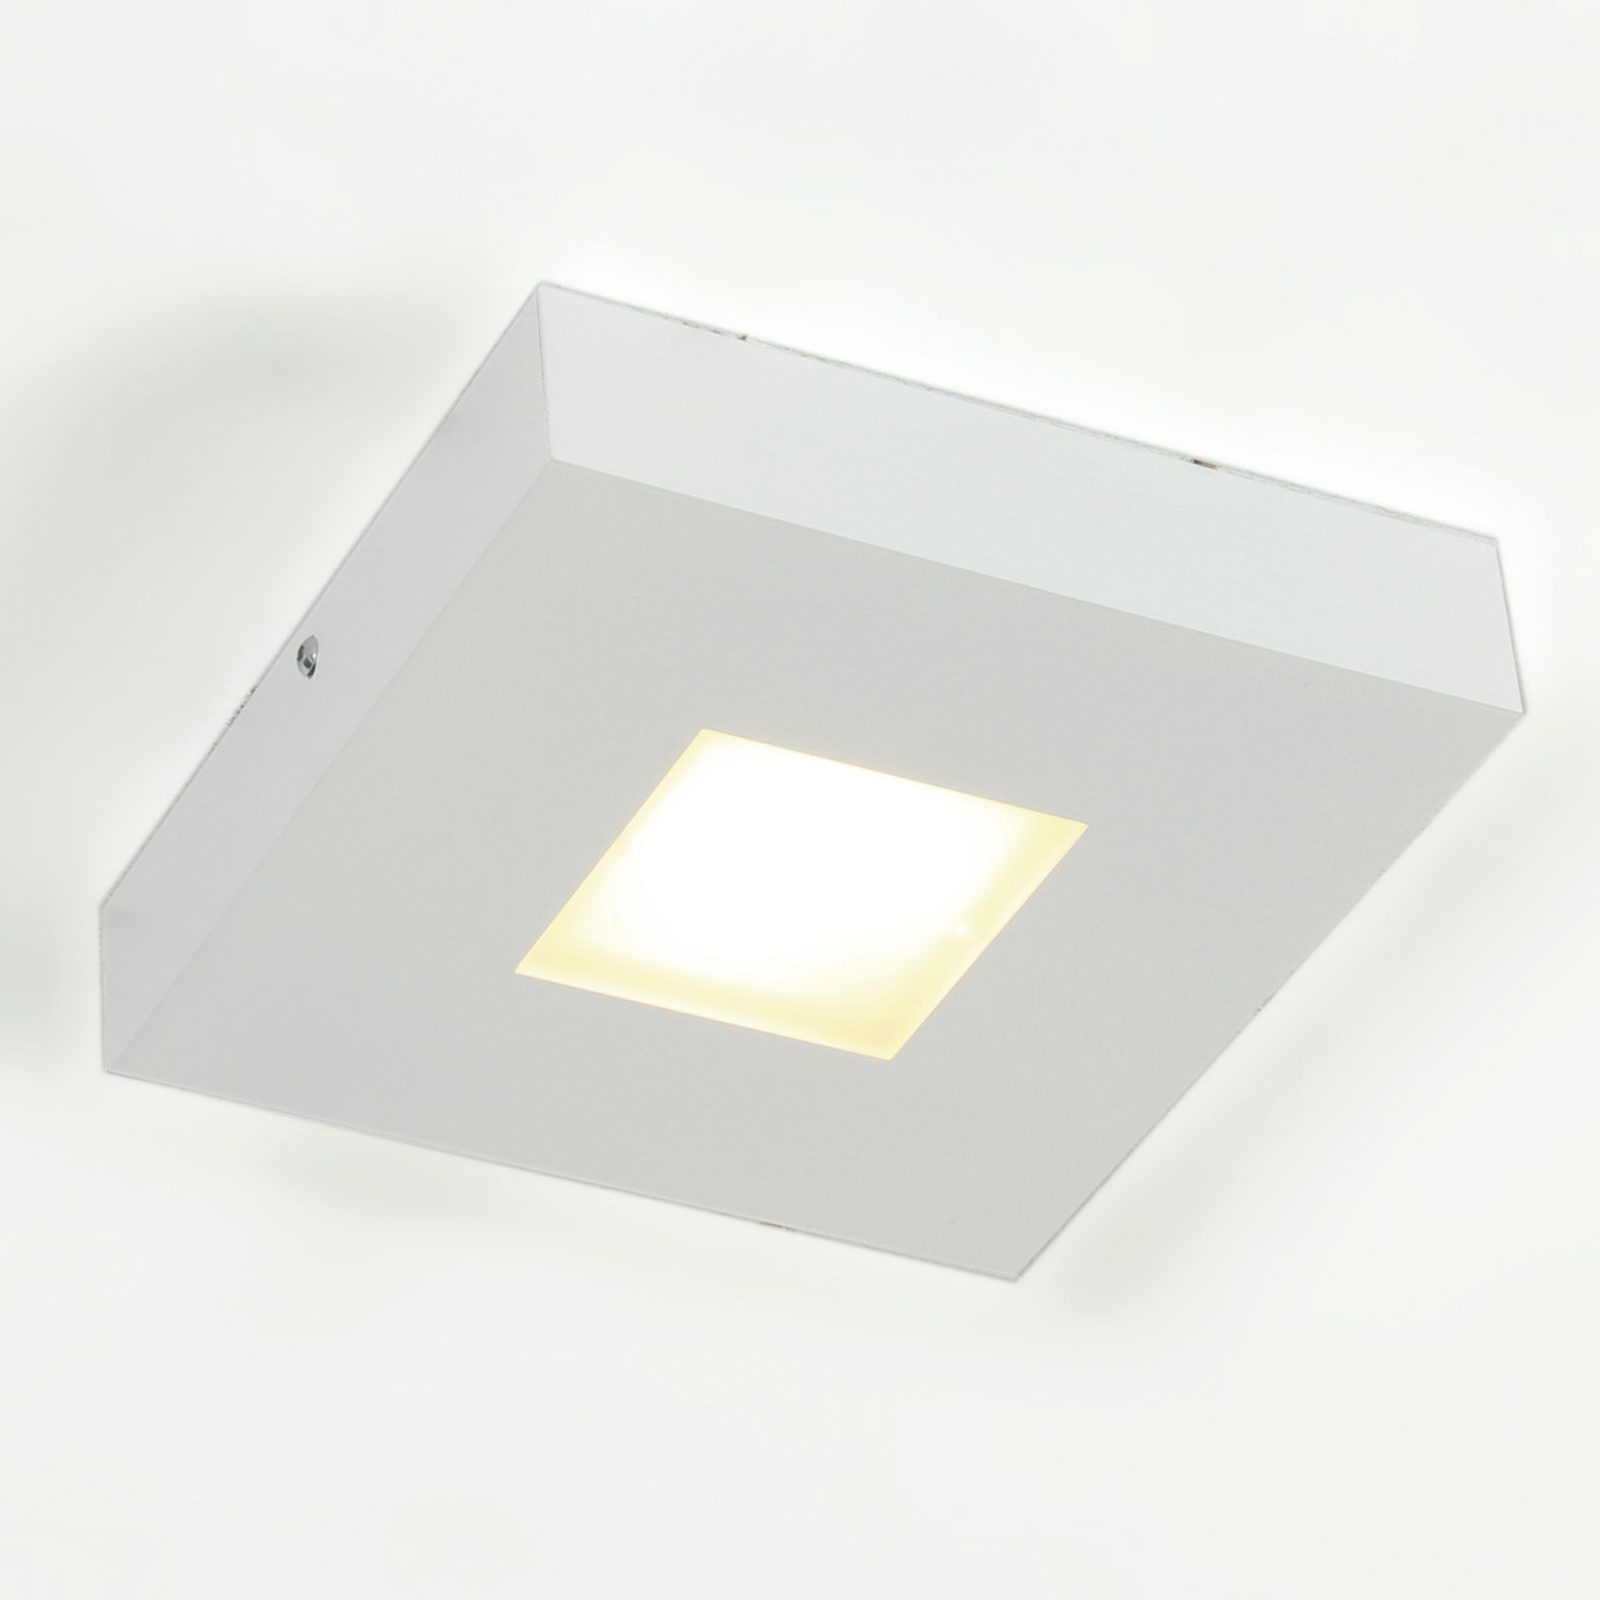 Hoogwaardige LED-plafondlamp Cubus, wit